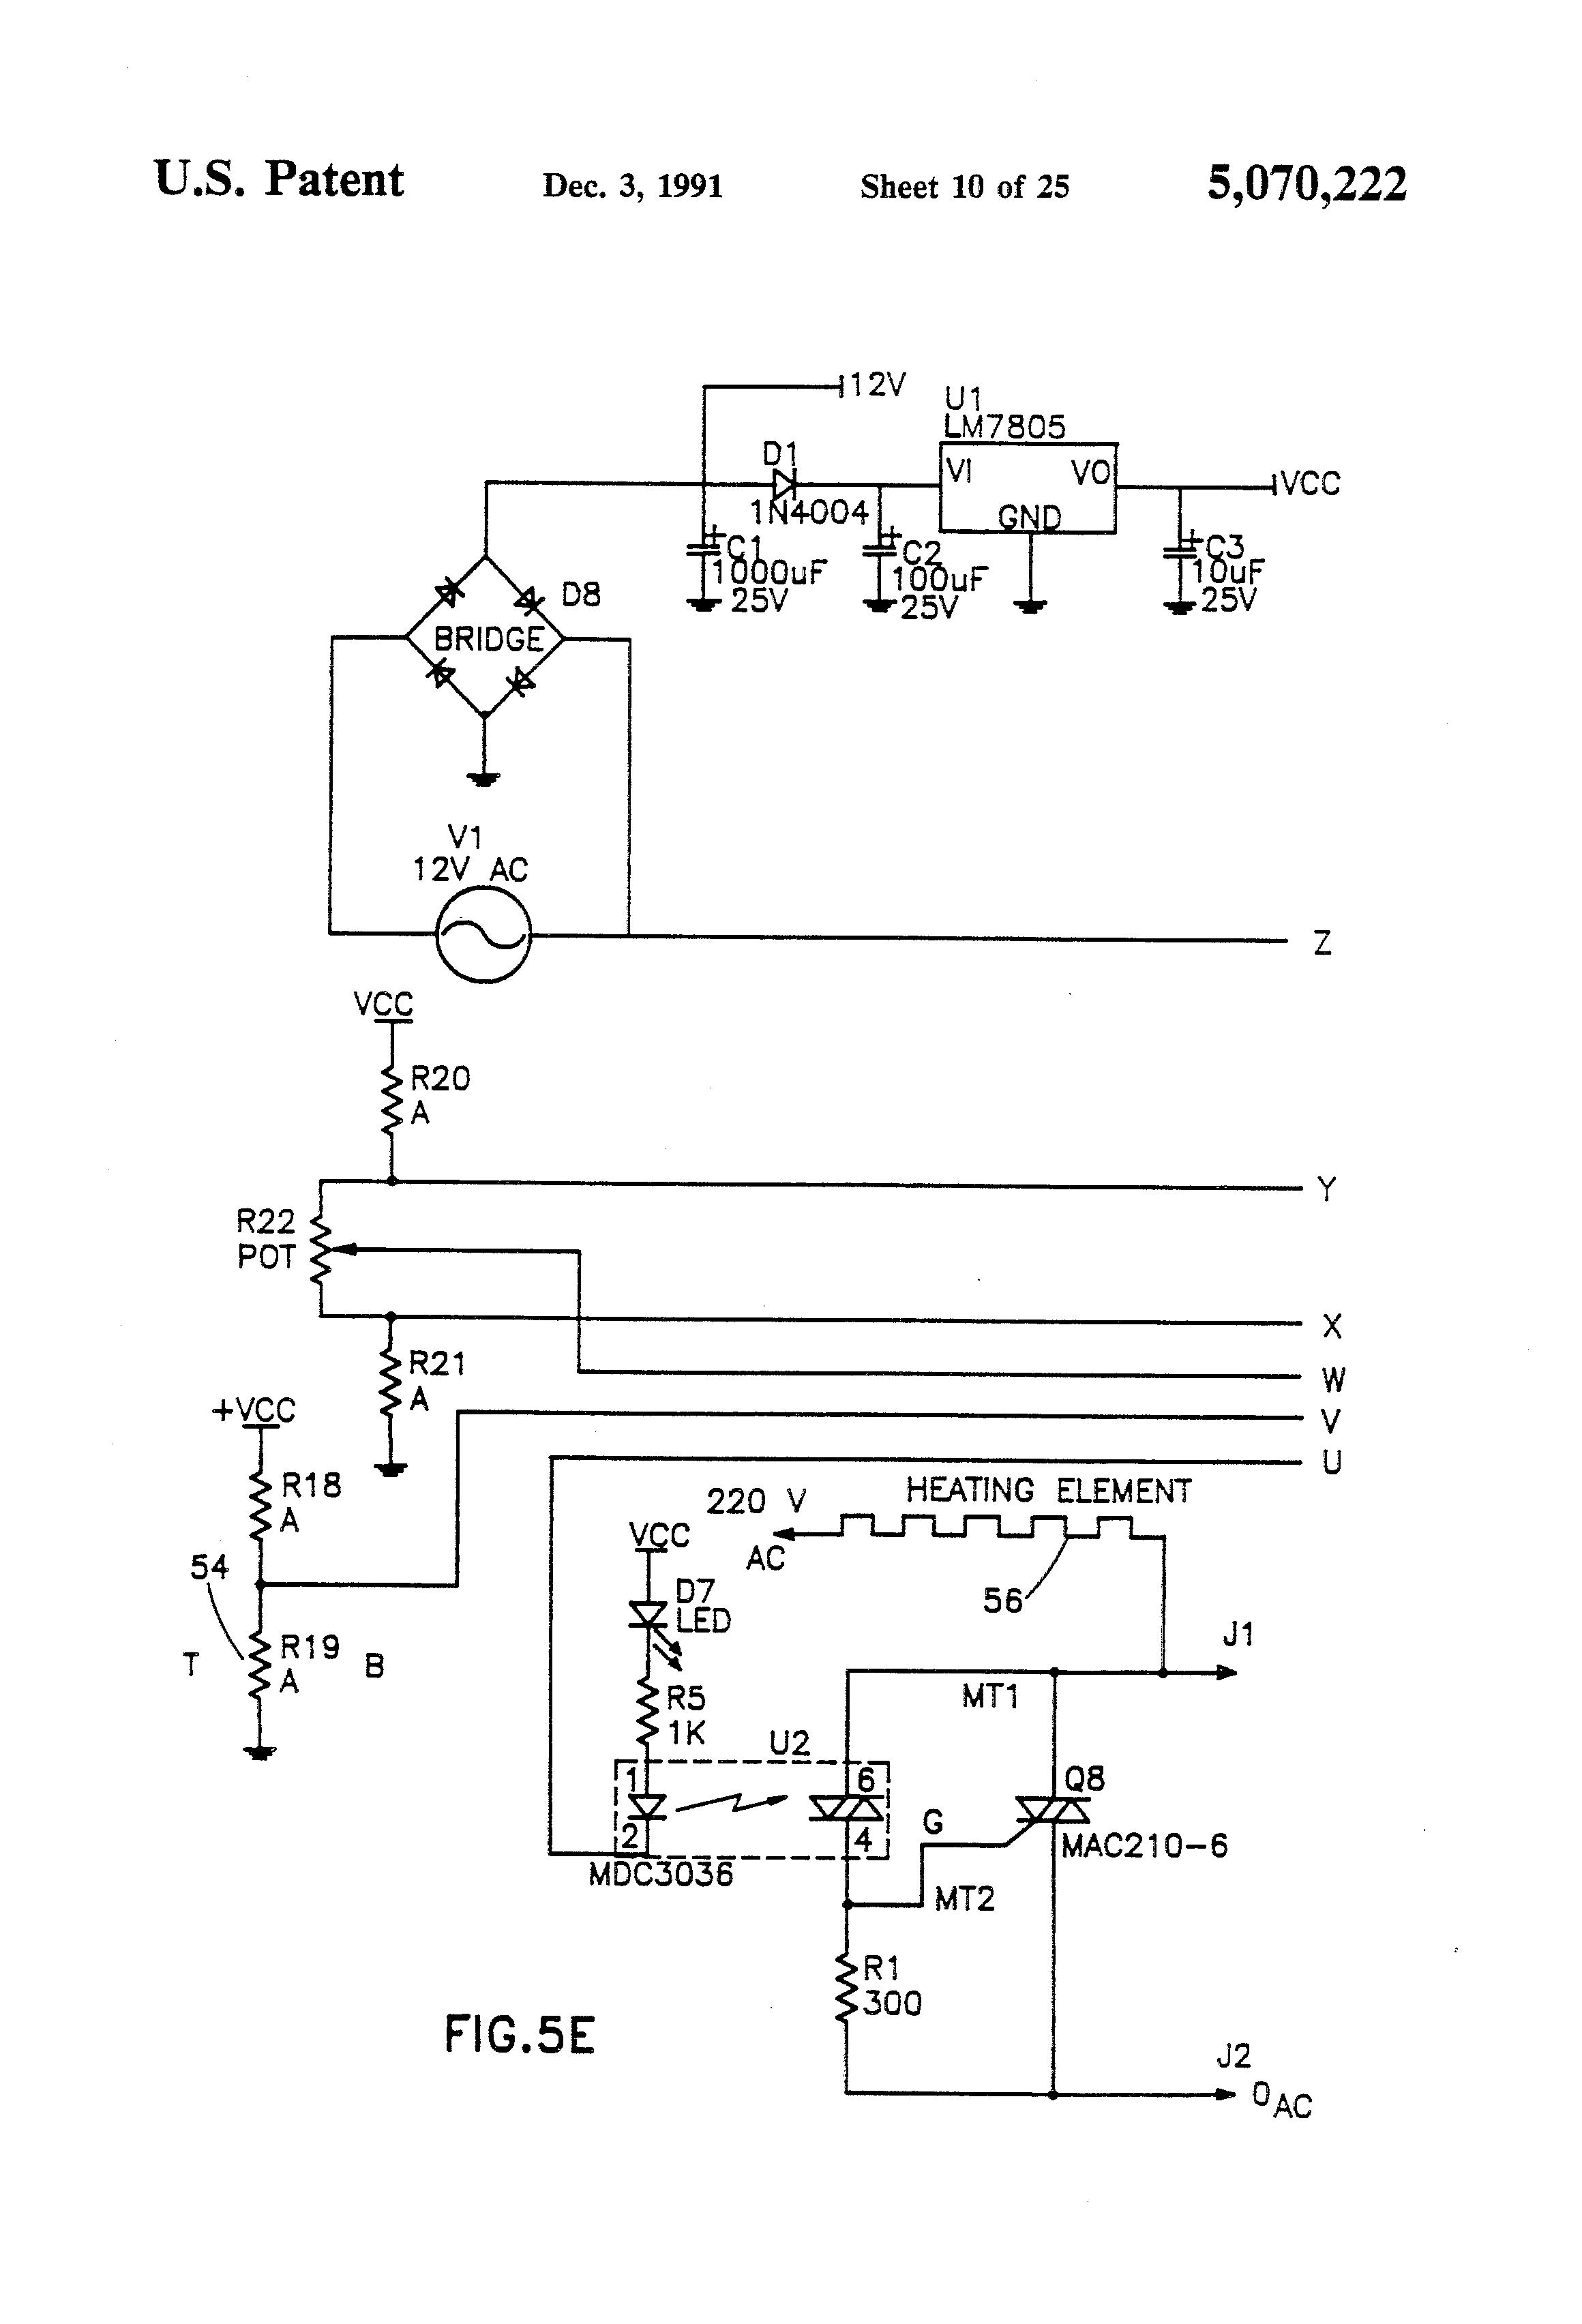 haflinger wiring schematic rh wxec info Automotive Wiring Schematics Simple Wiring Schematics